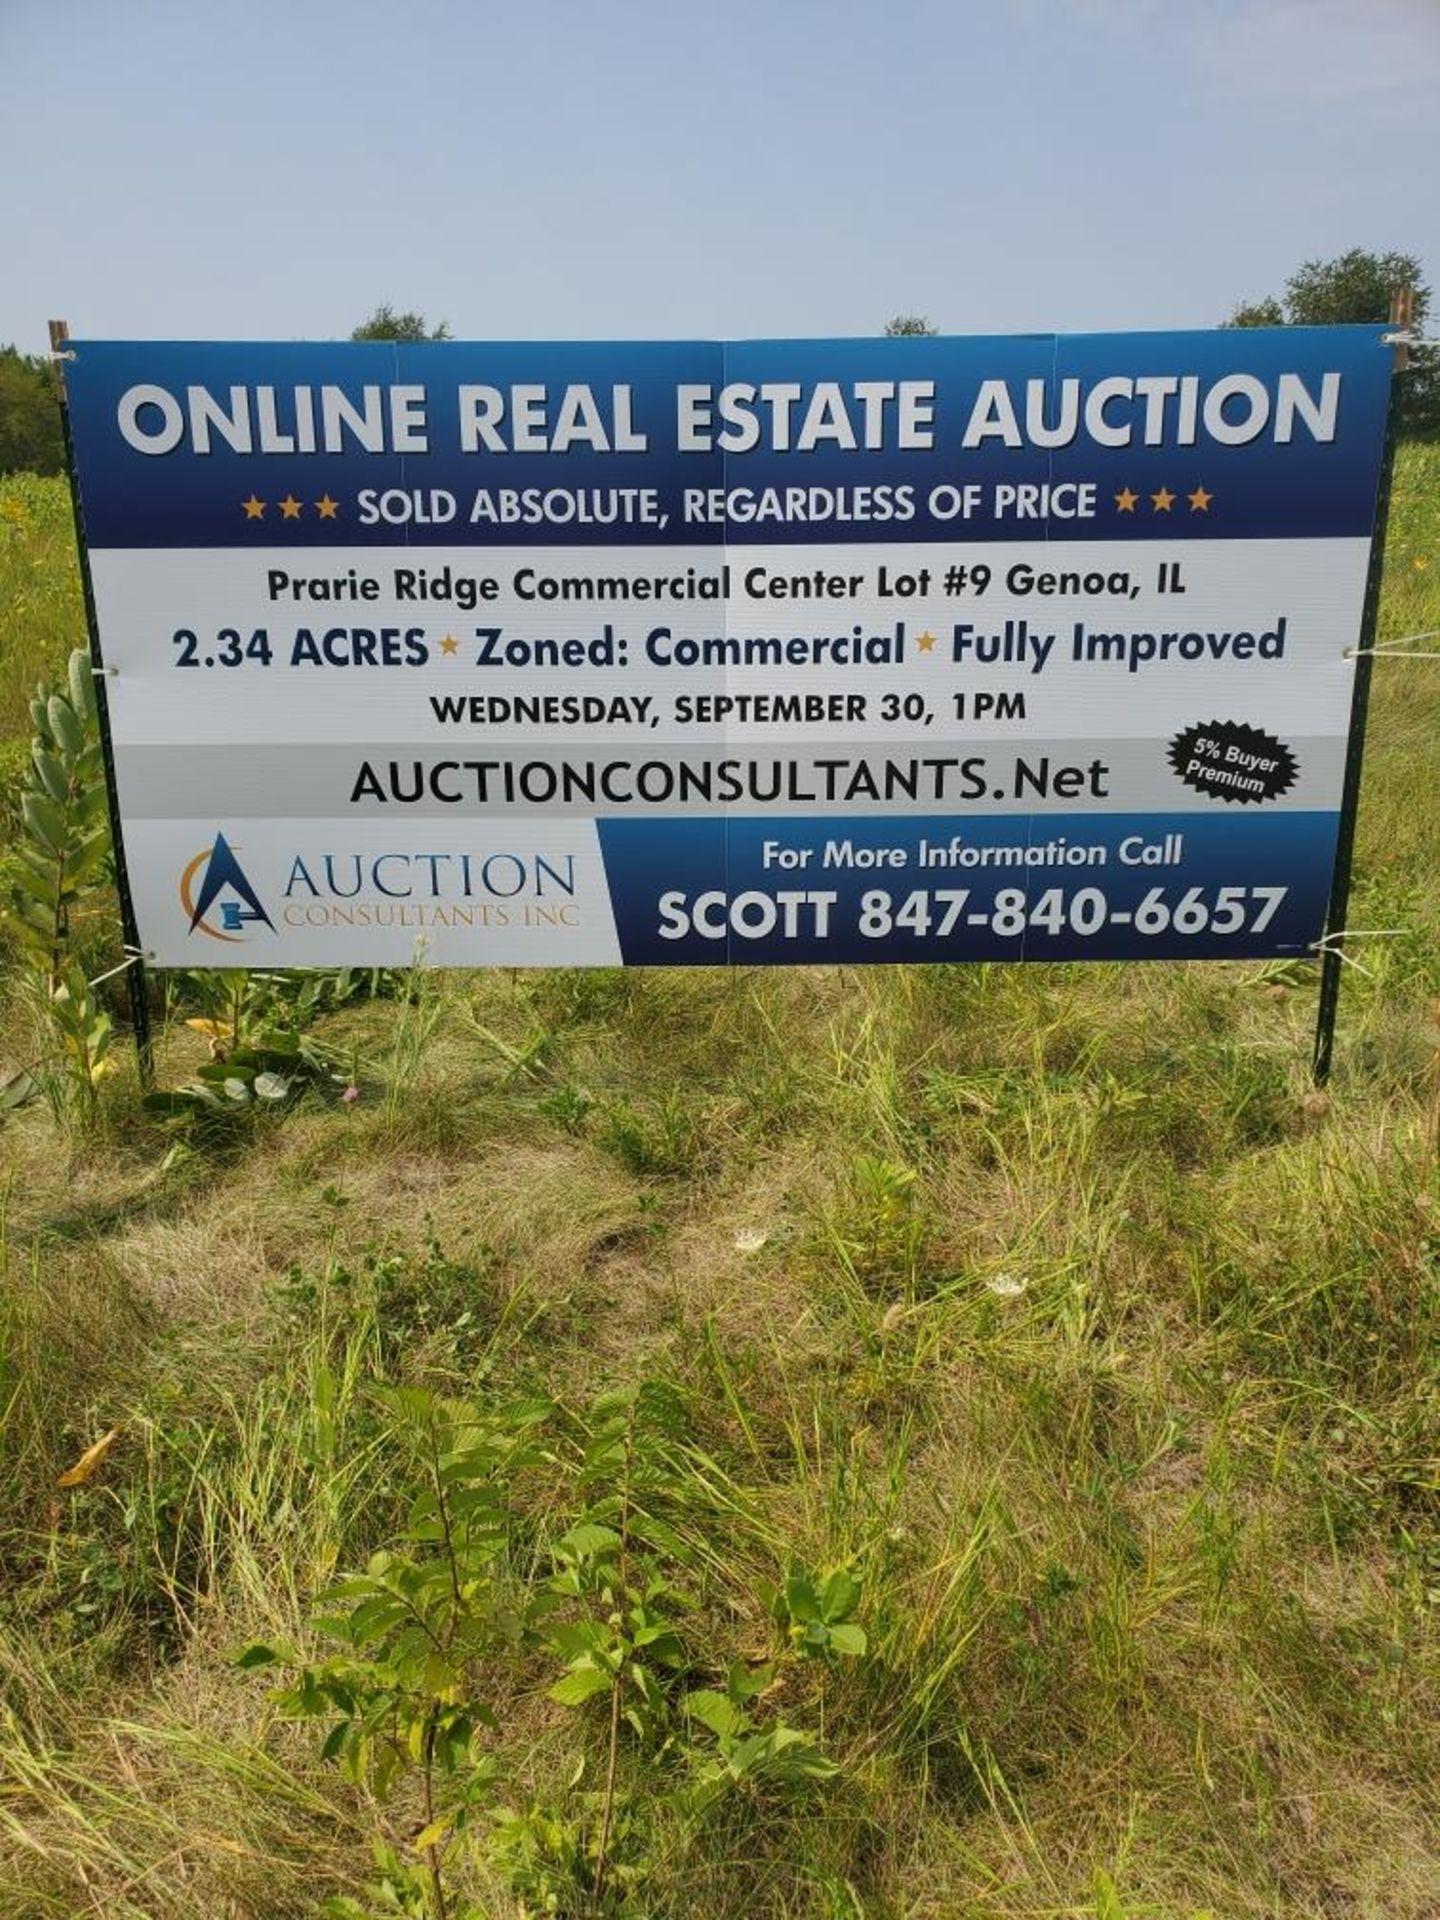 Lot 1 - 2.34 Acres, Prairie Ridge Commercial Center Lot 9, 401 S.Hadsall St. Genoa, IL